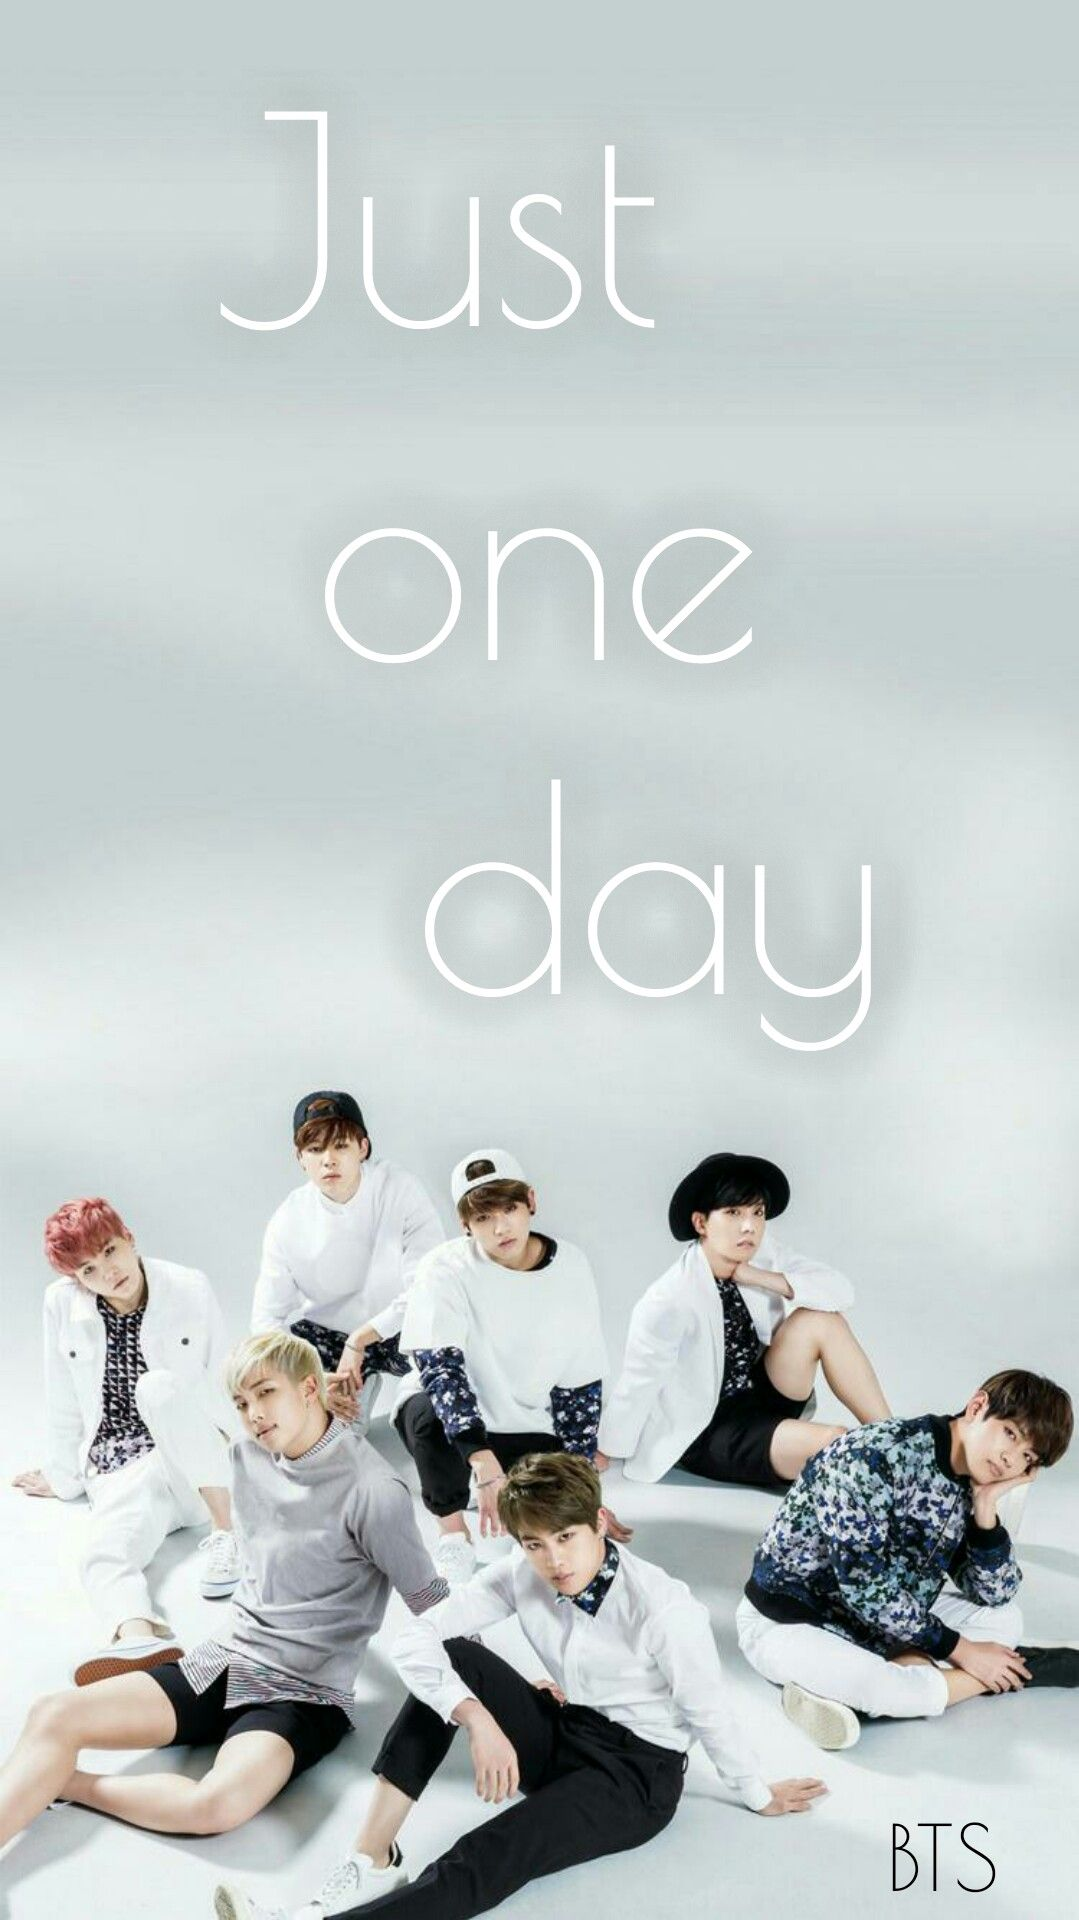 Bts Just One Day Bts Bangtanboys Justoneday Jin Jimin Jungkook